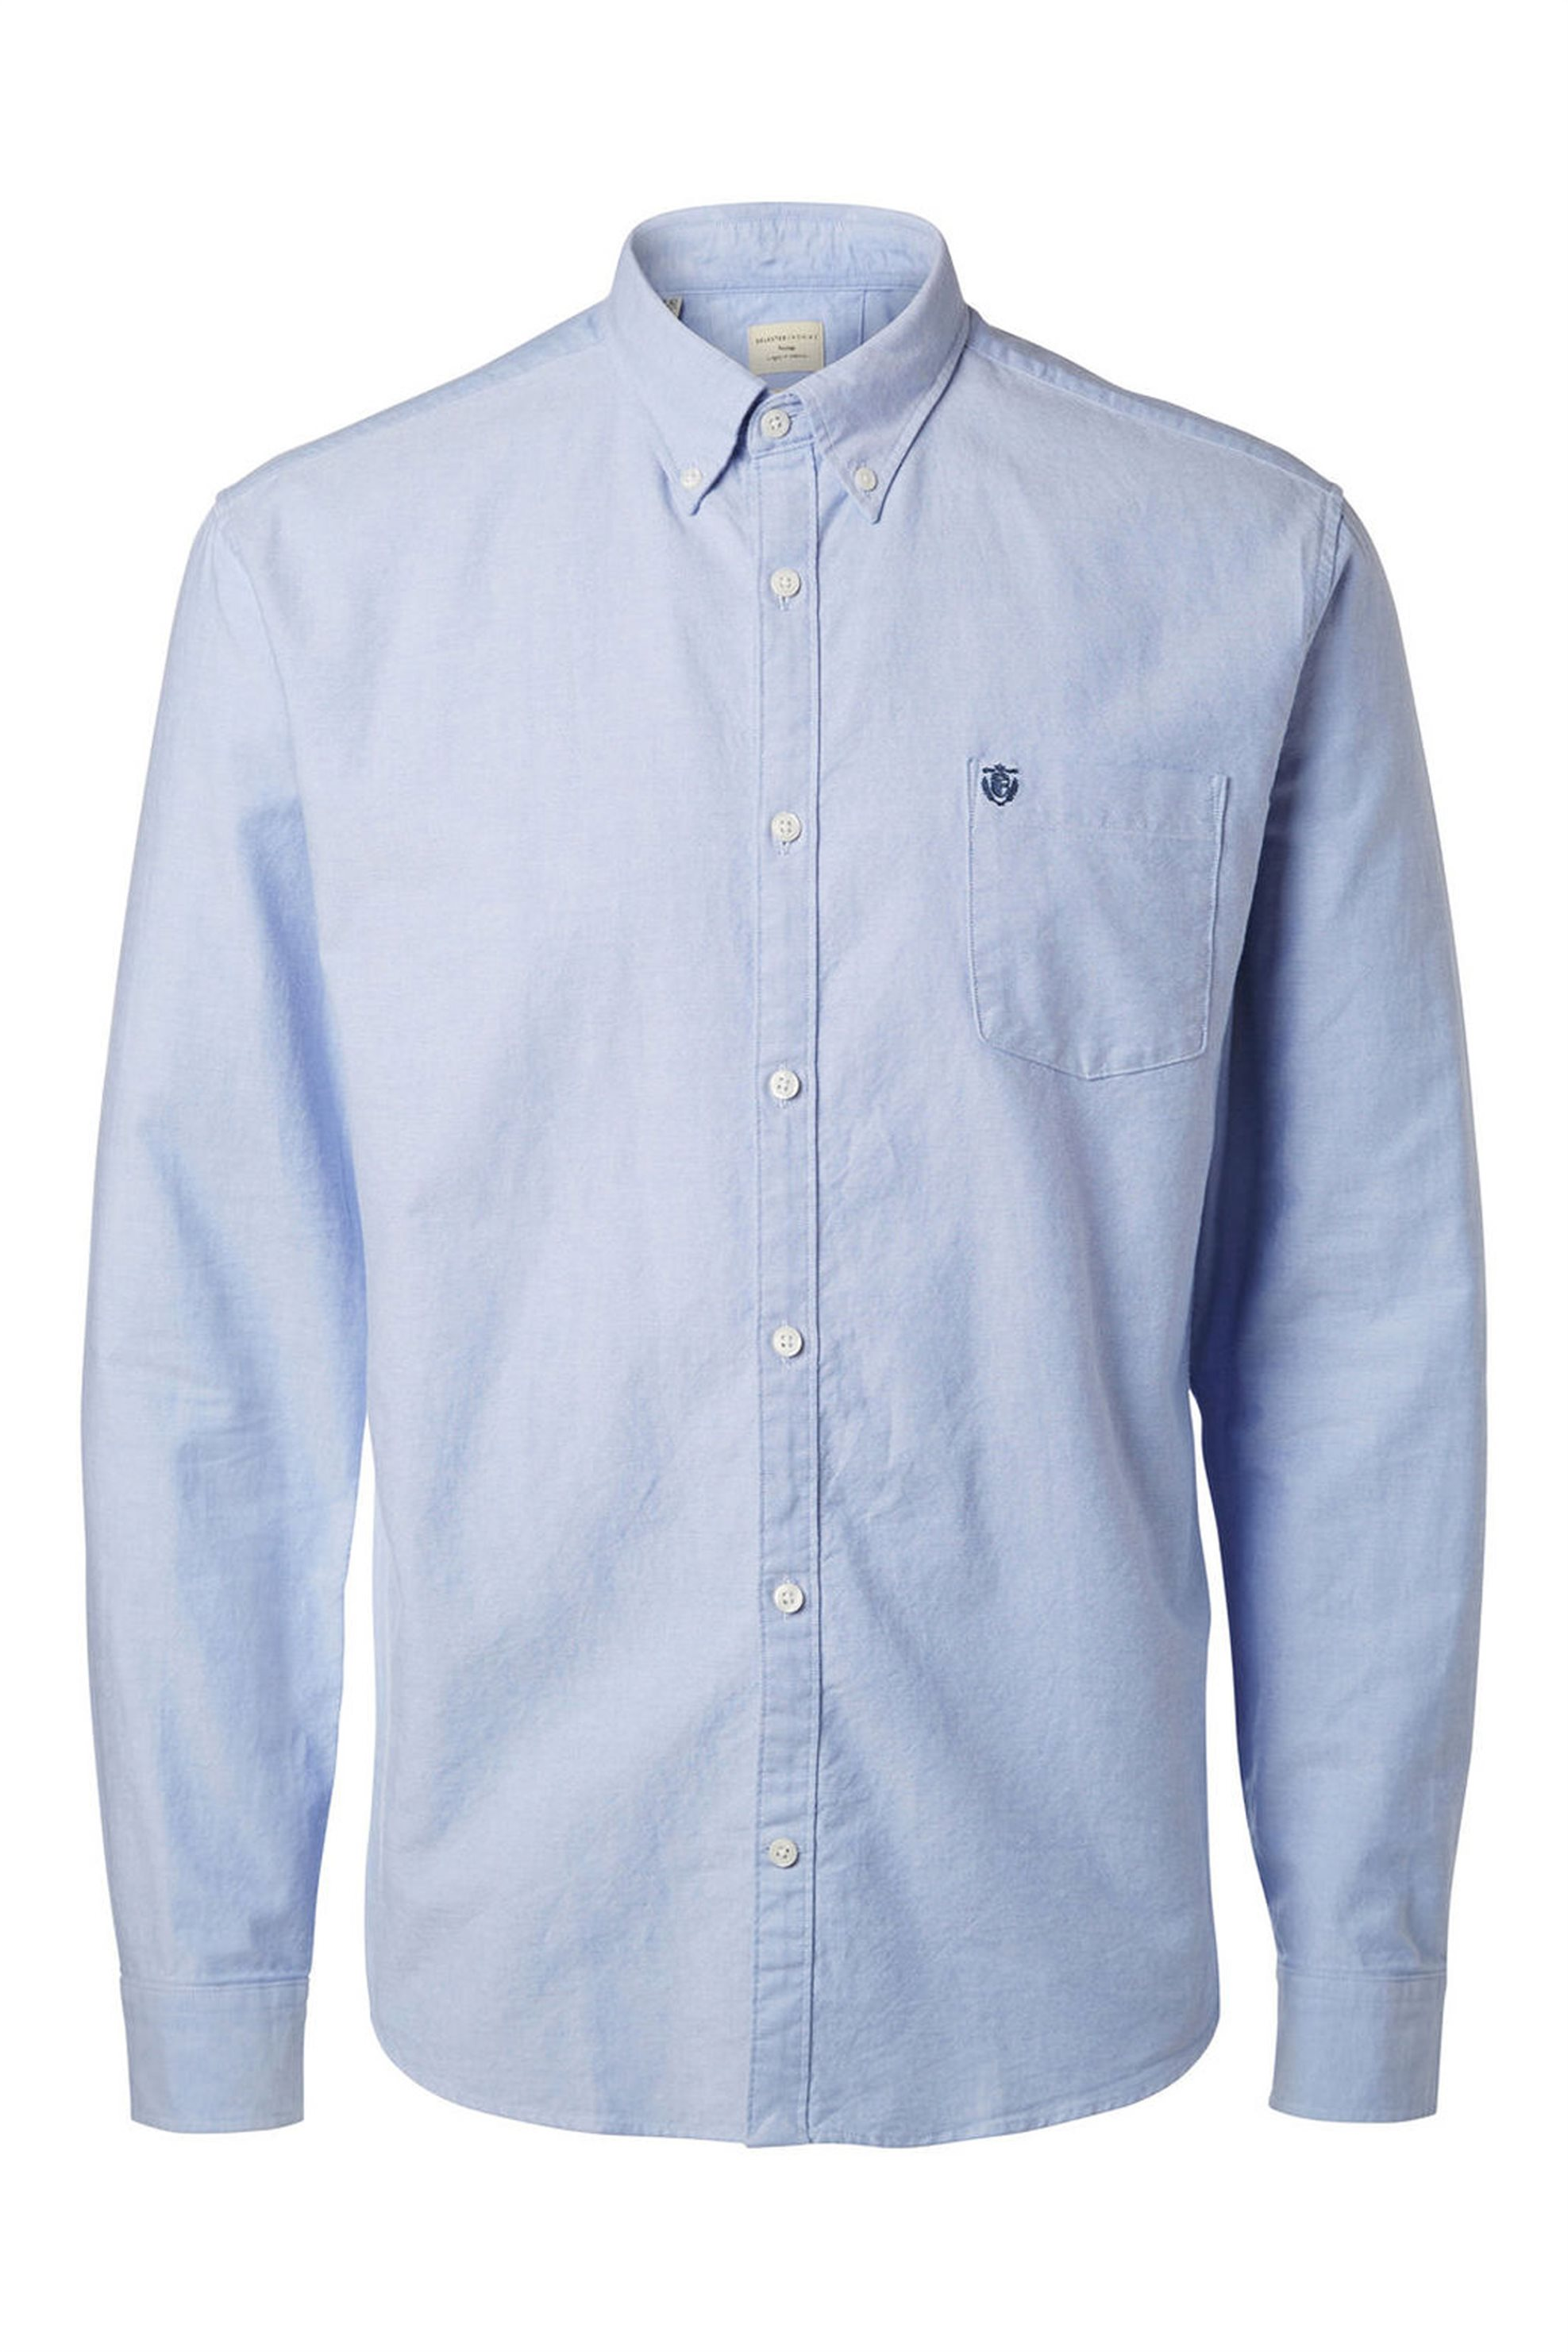 5b42b58b5a21 SELECTED ανδρικό πουκάμισο Oxford - 16040493 - Γαλάζιο